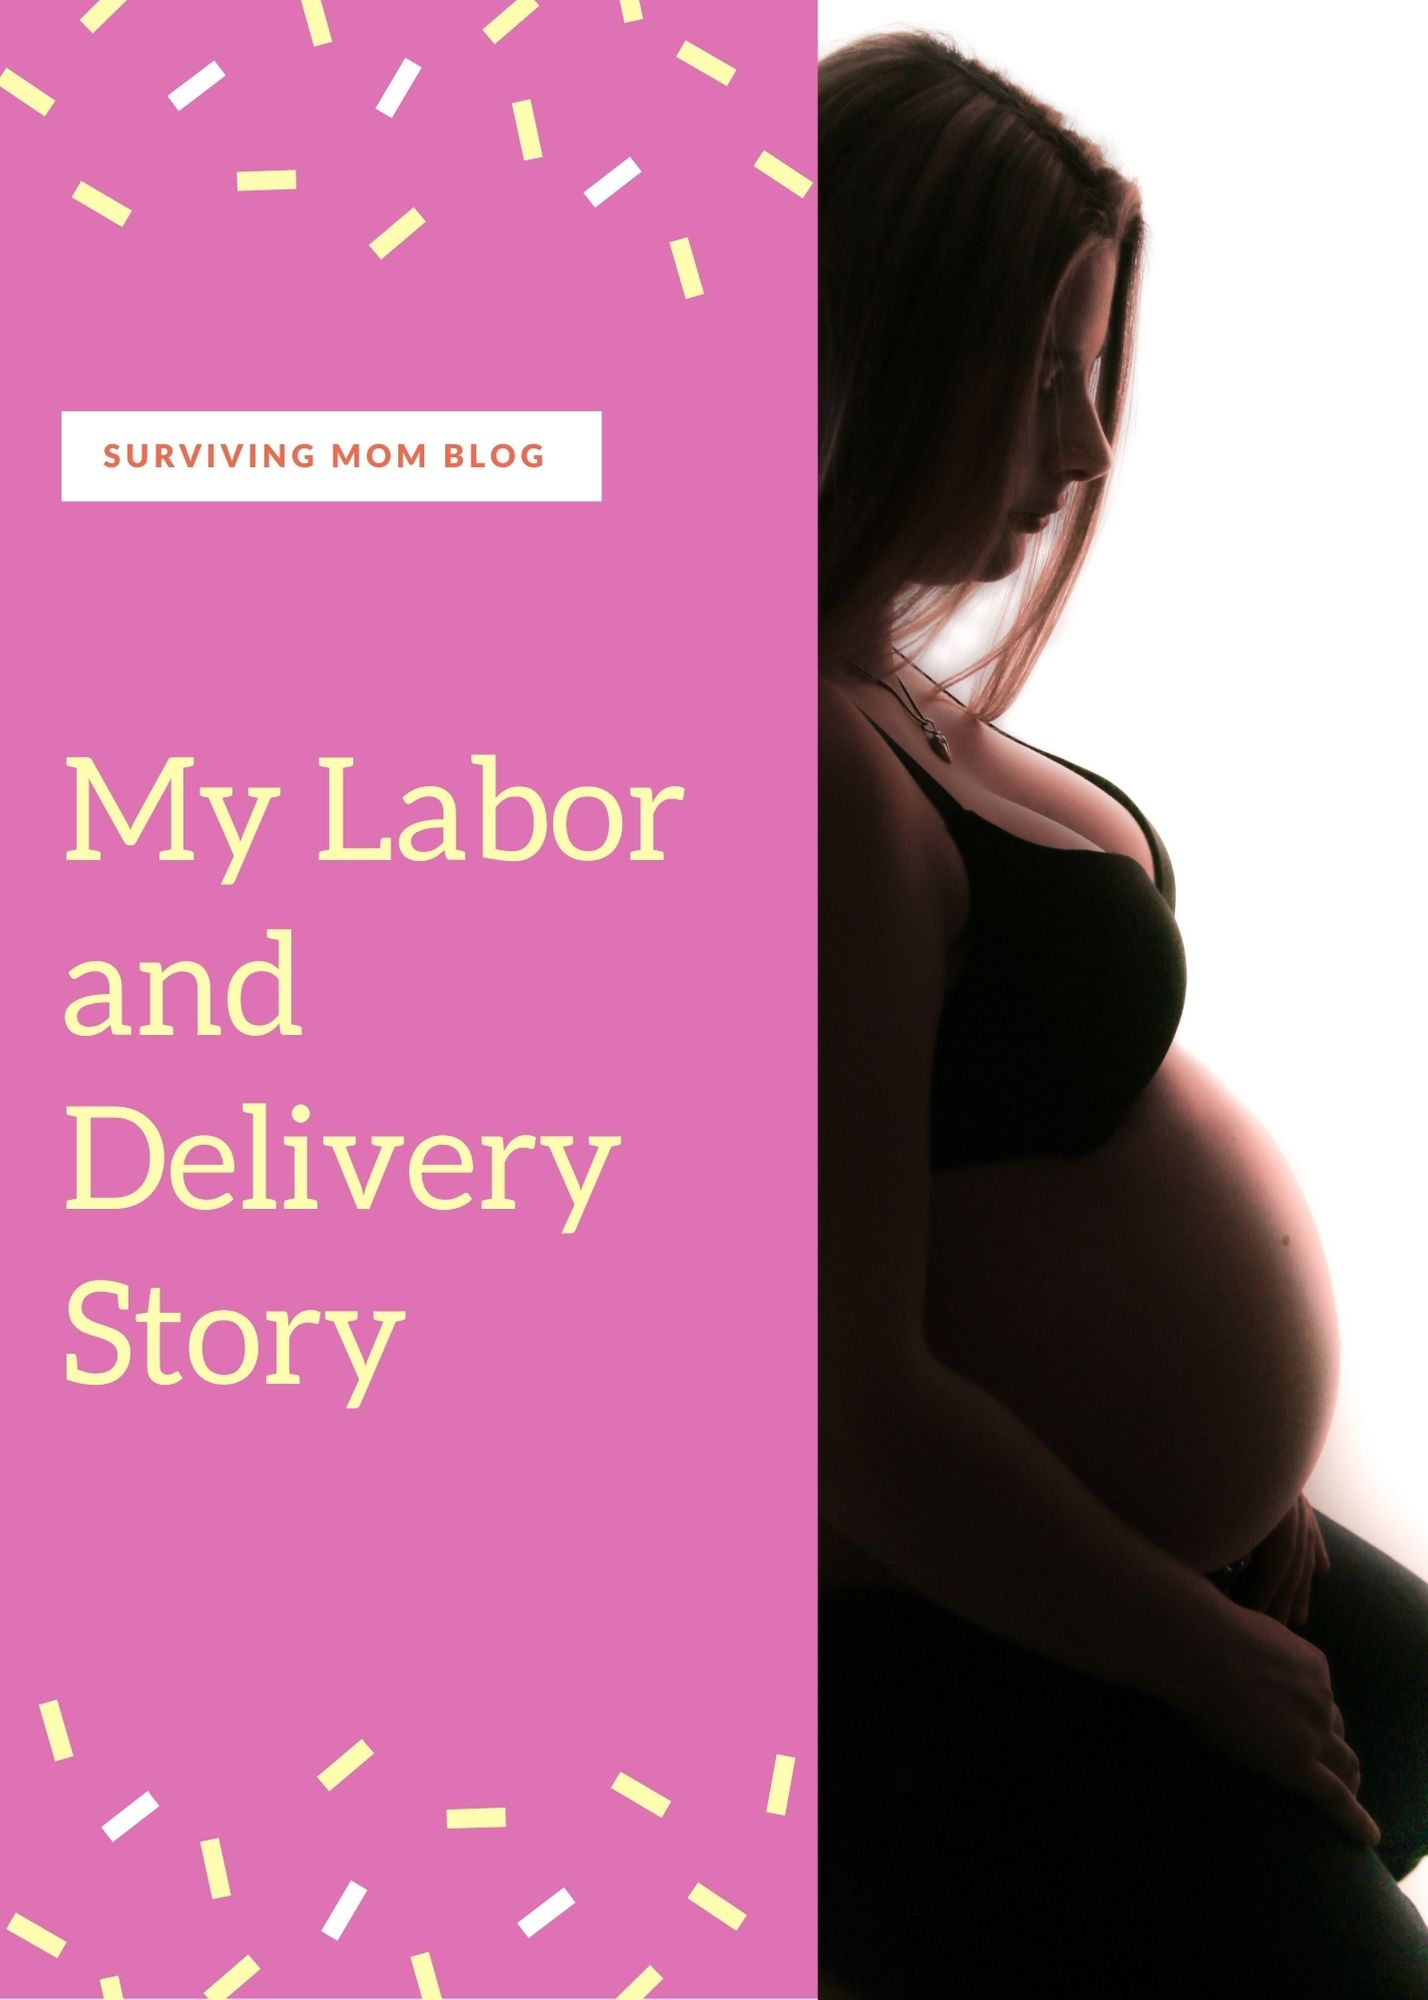 My Labor Story